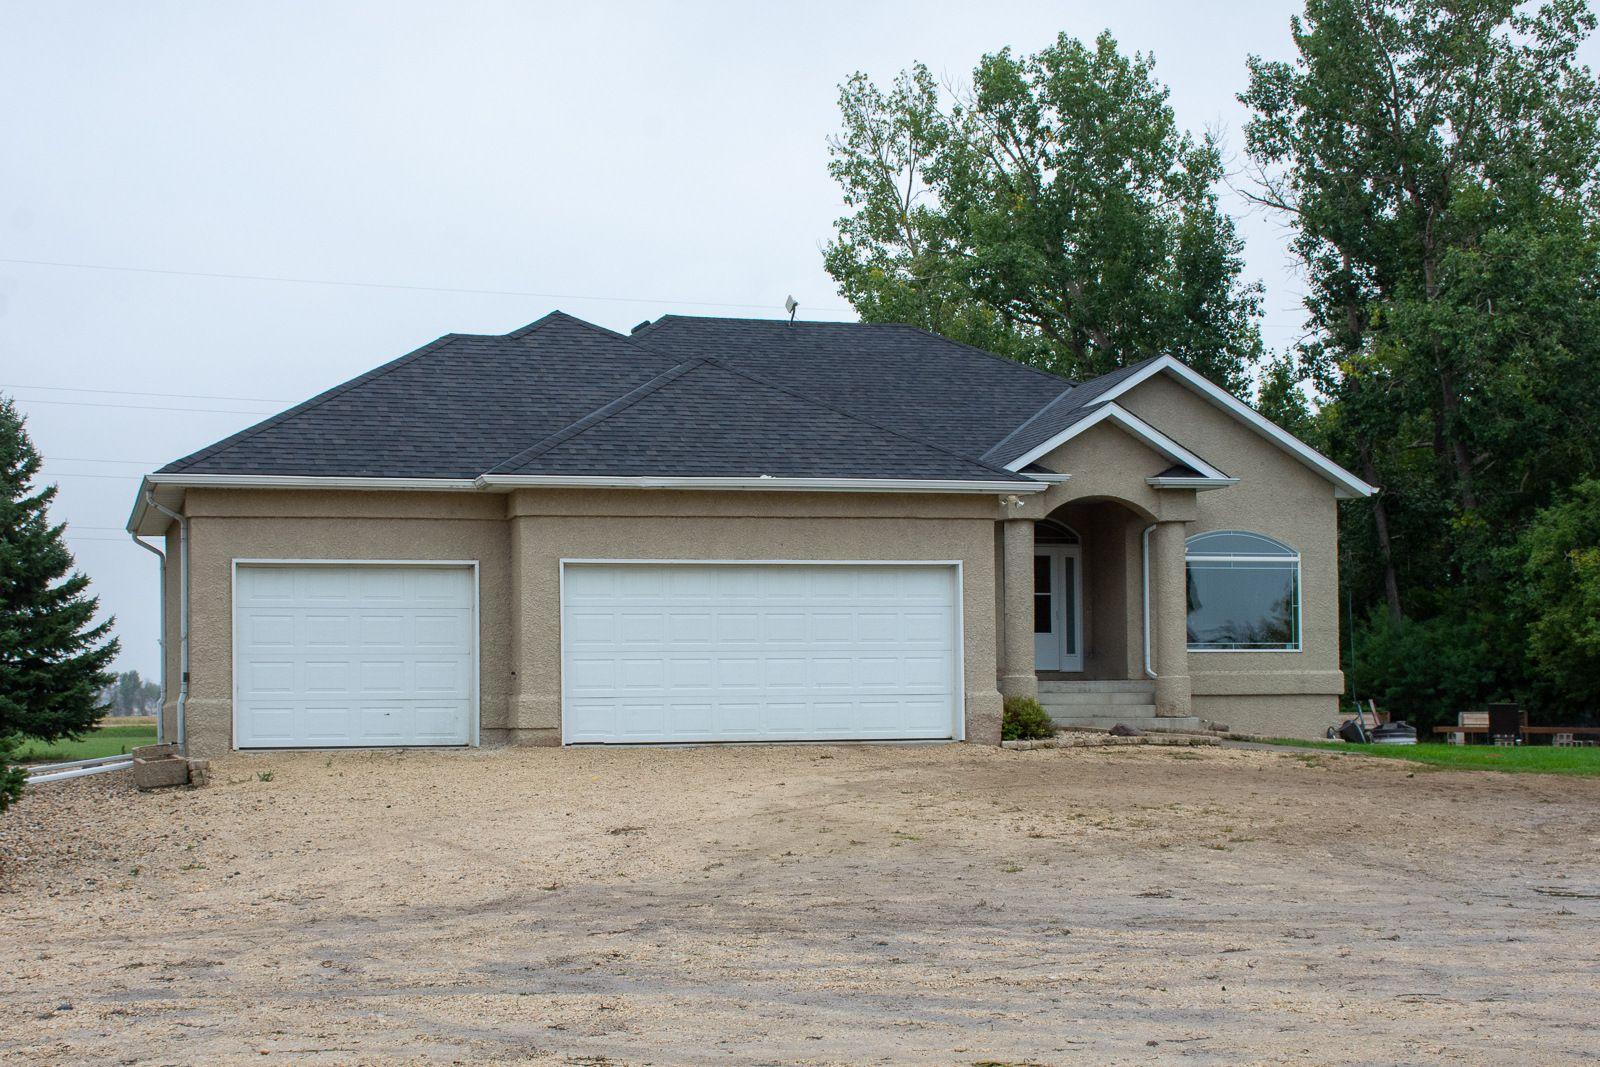 Main Photo: 43073 Rd 65 N in Portage la Prairie RM: House for sale : MLS®# 202120914